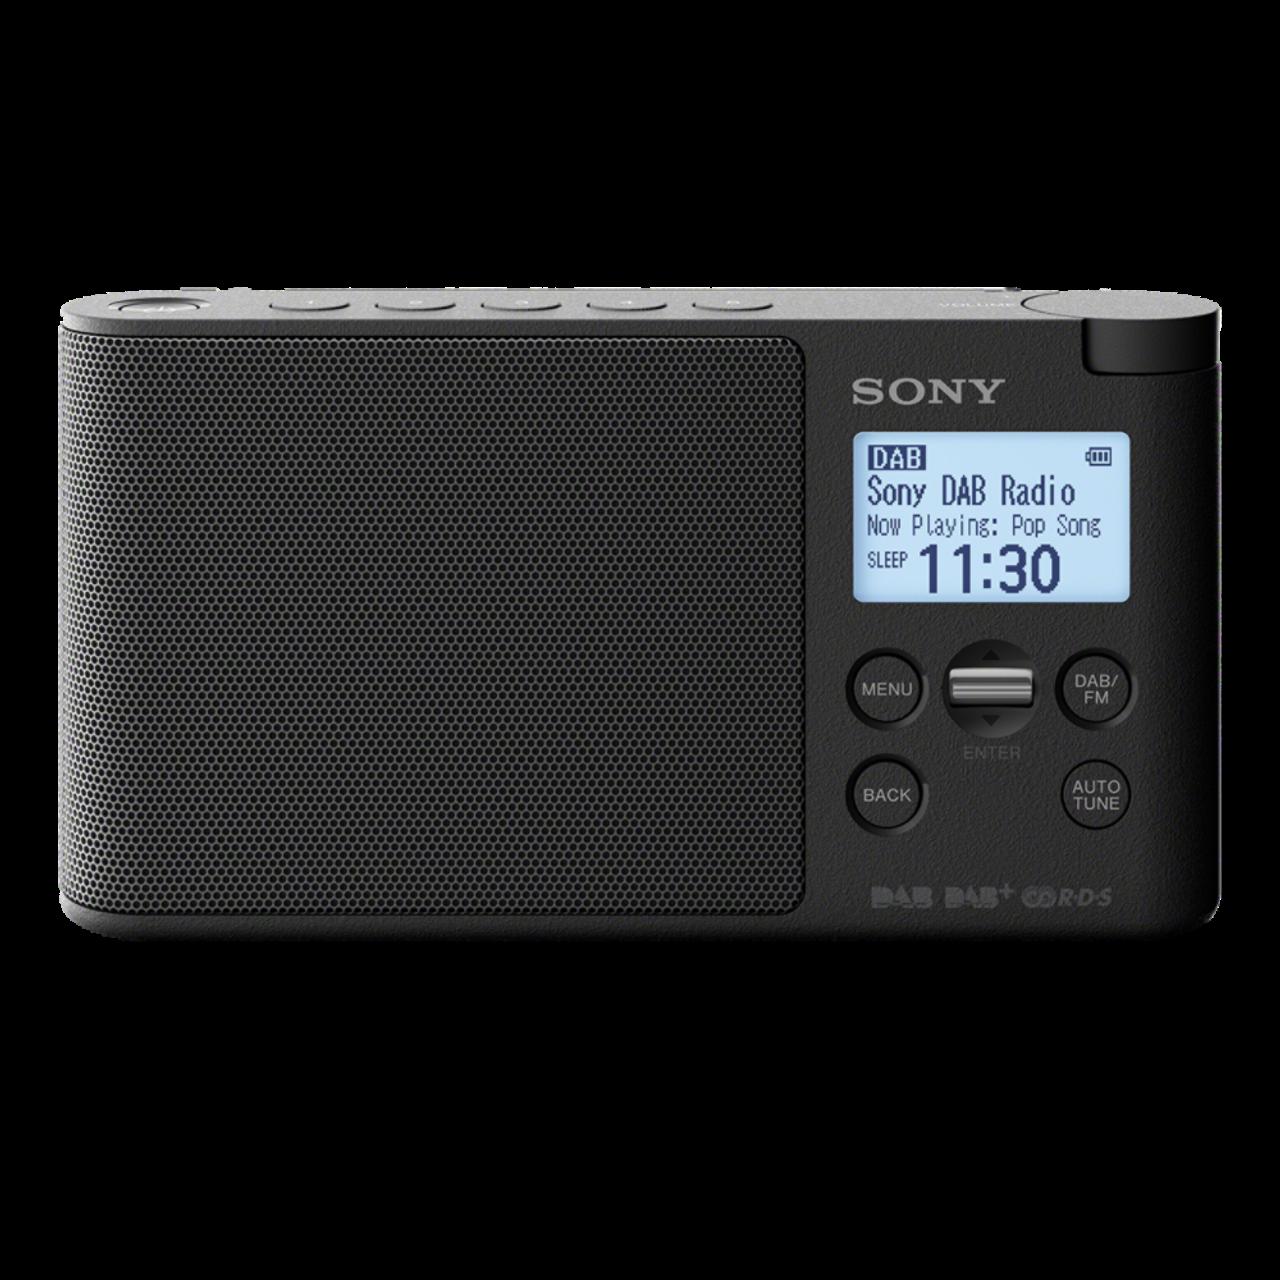 sony xdr s41d portable dab dab radio black ask outlets ltd. Black Bedroom Furniture Sets. Home Design Ideas